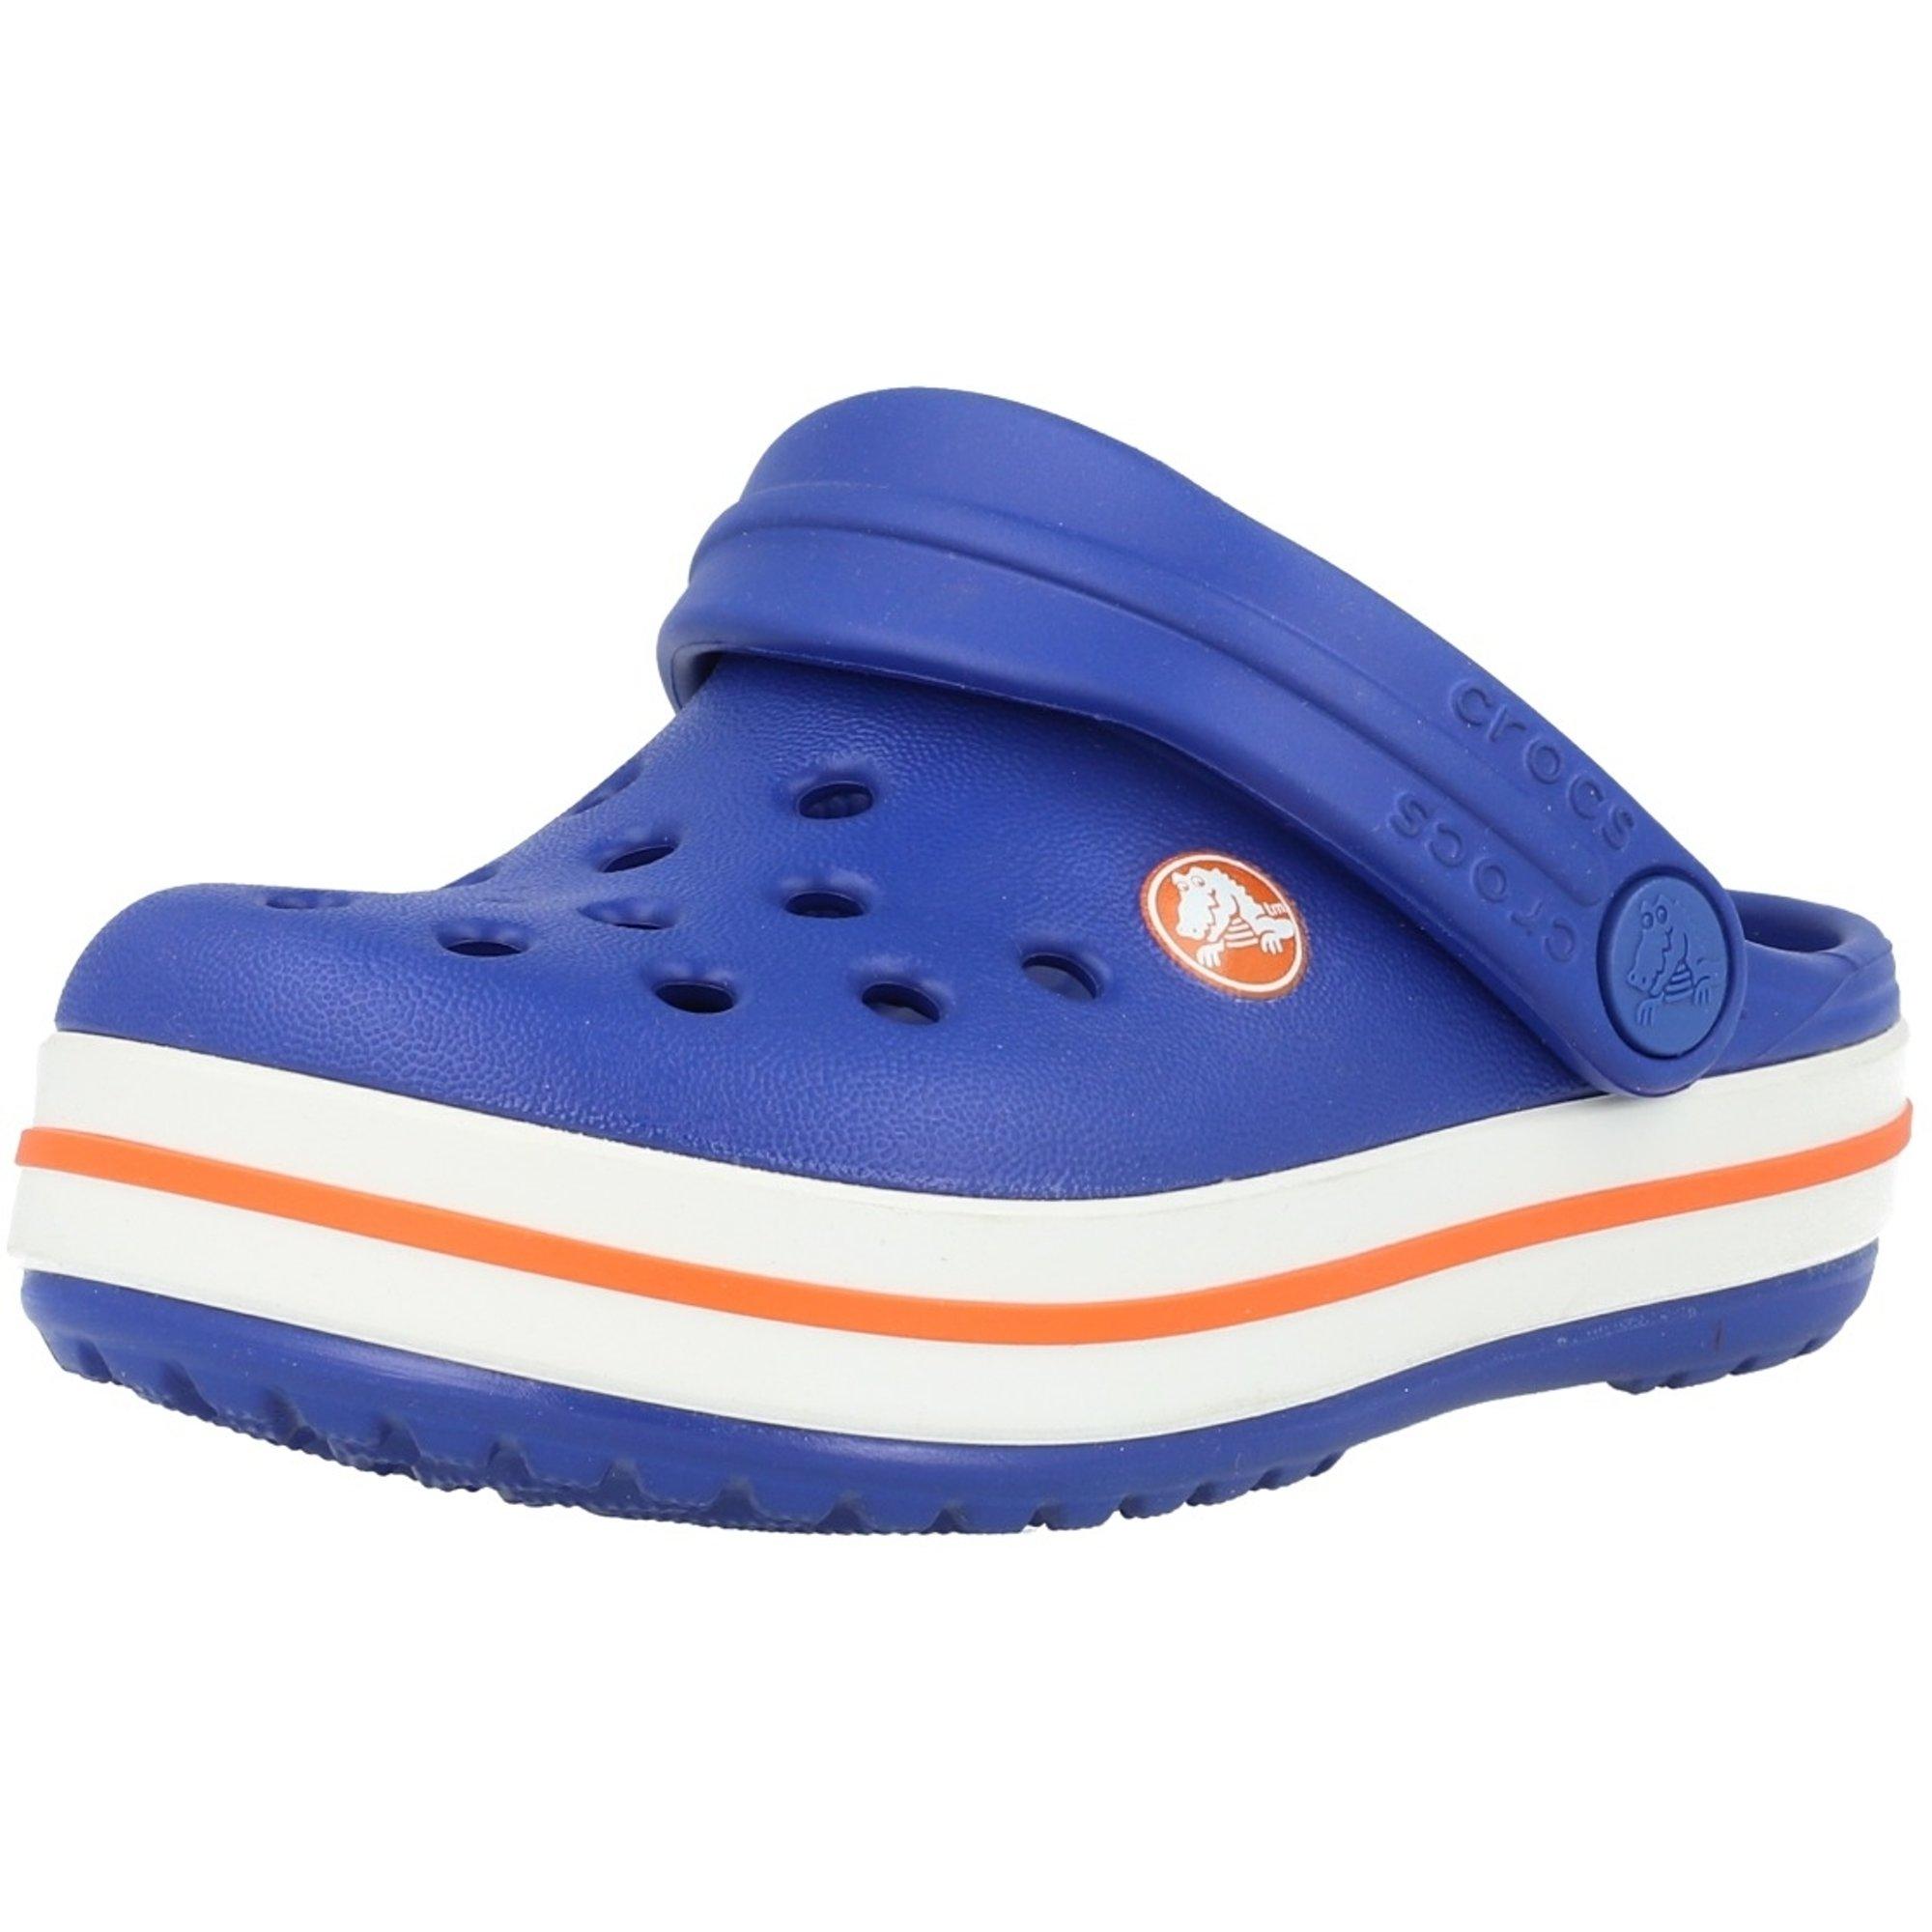 Crocs Kids Crocband Clog Cerulean Blue